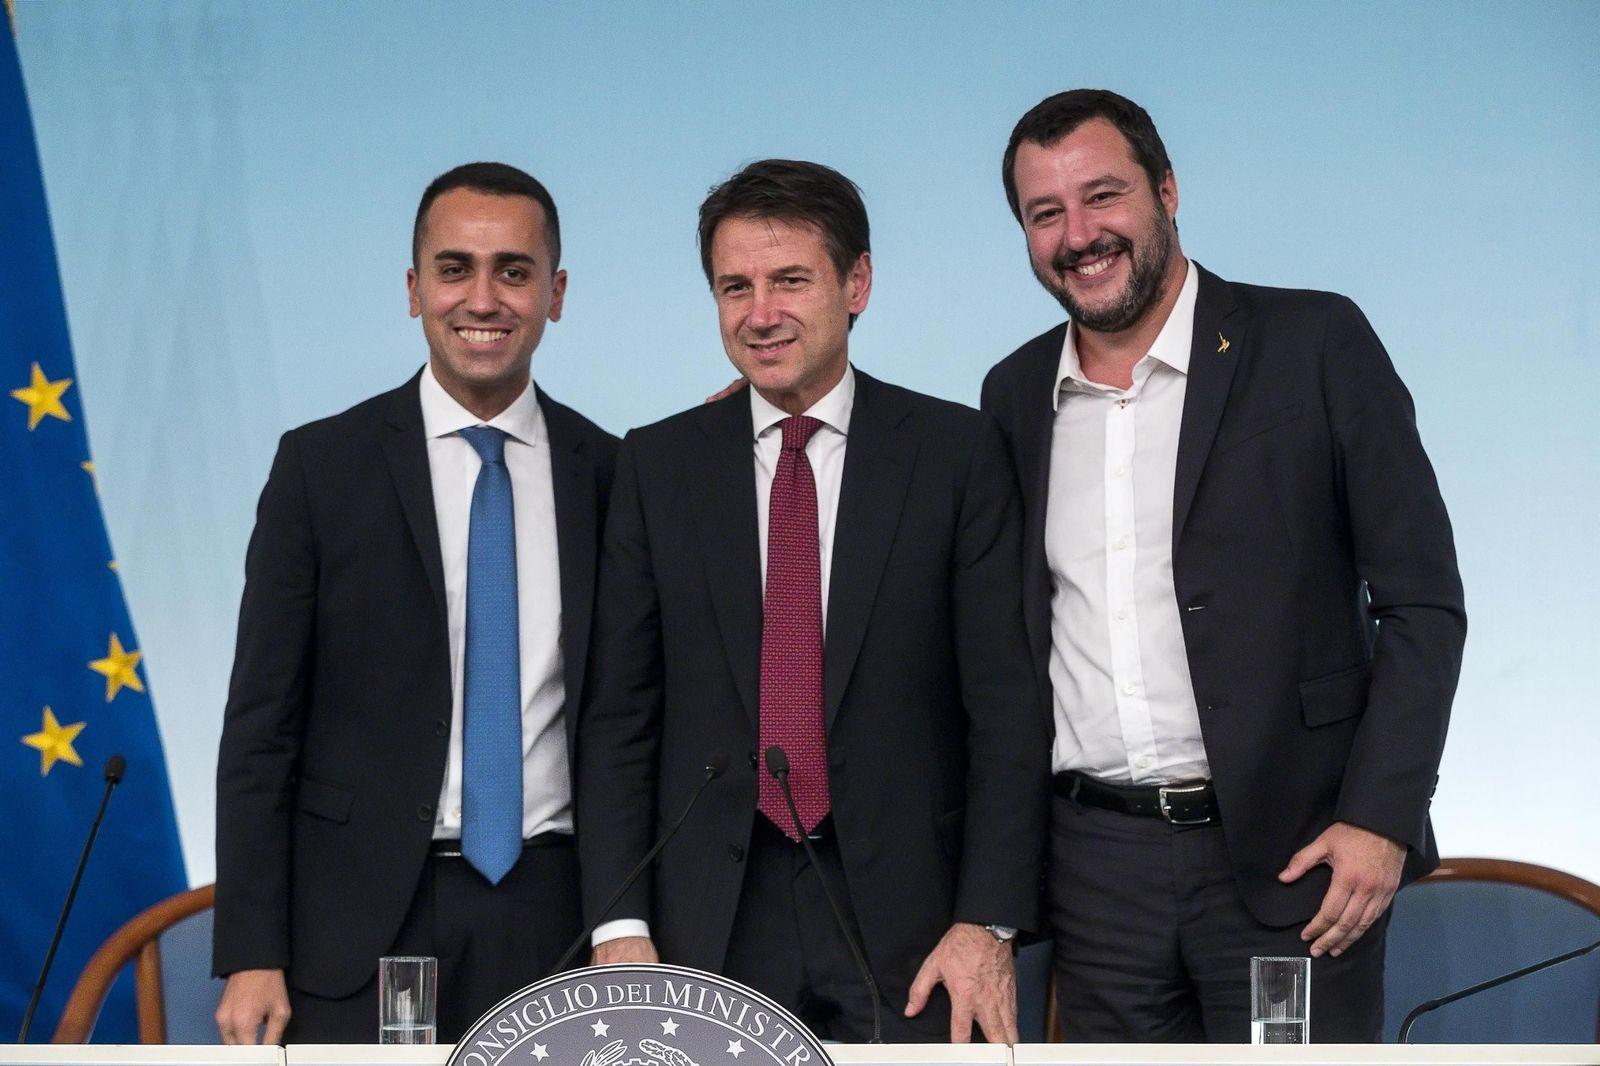 Luigi Di Maio/ Giuseppe Conte/ Matteo Salvini